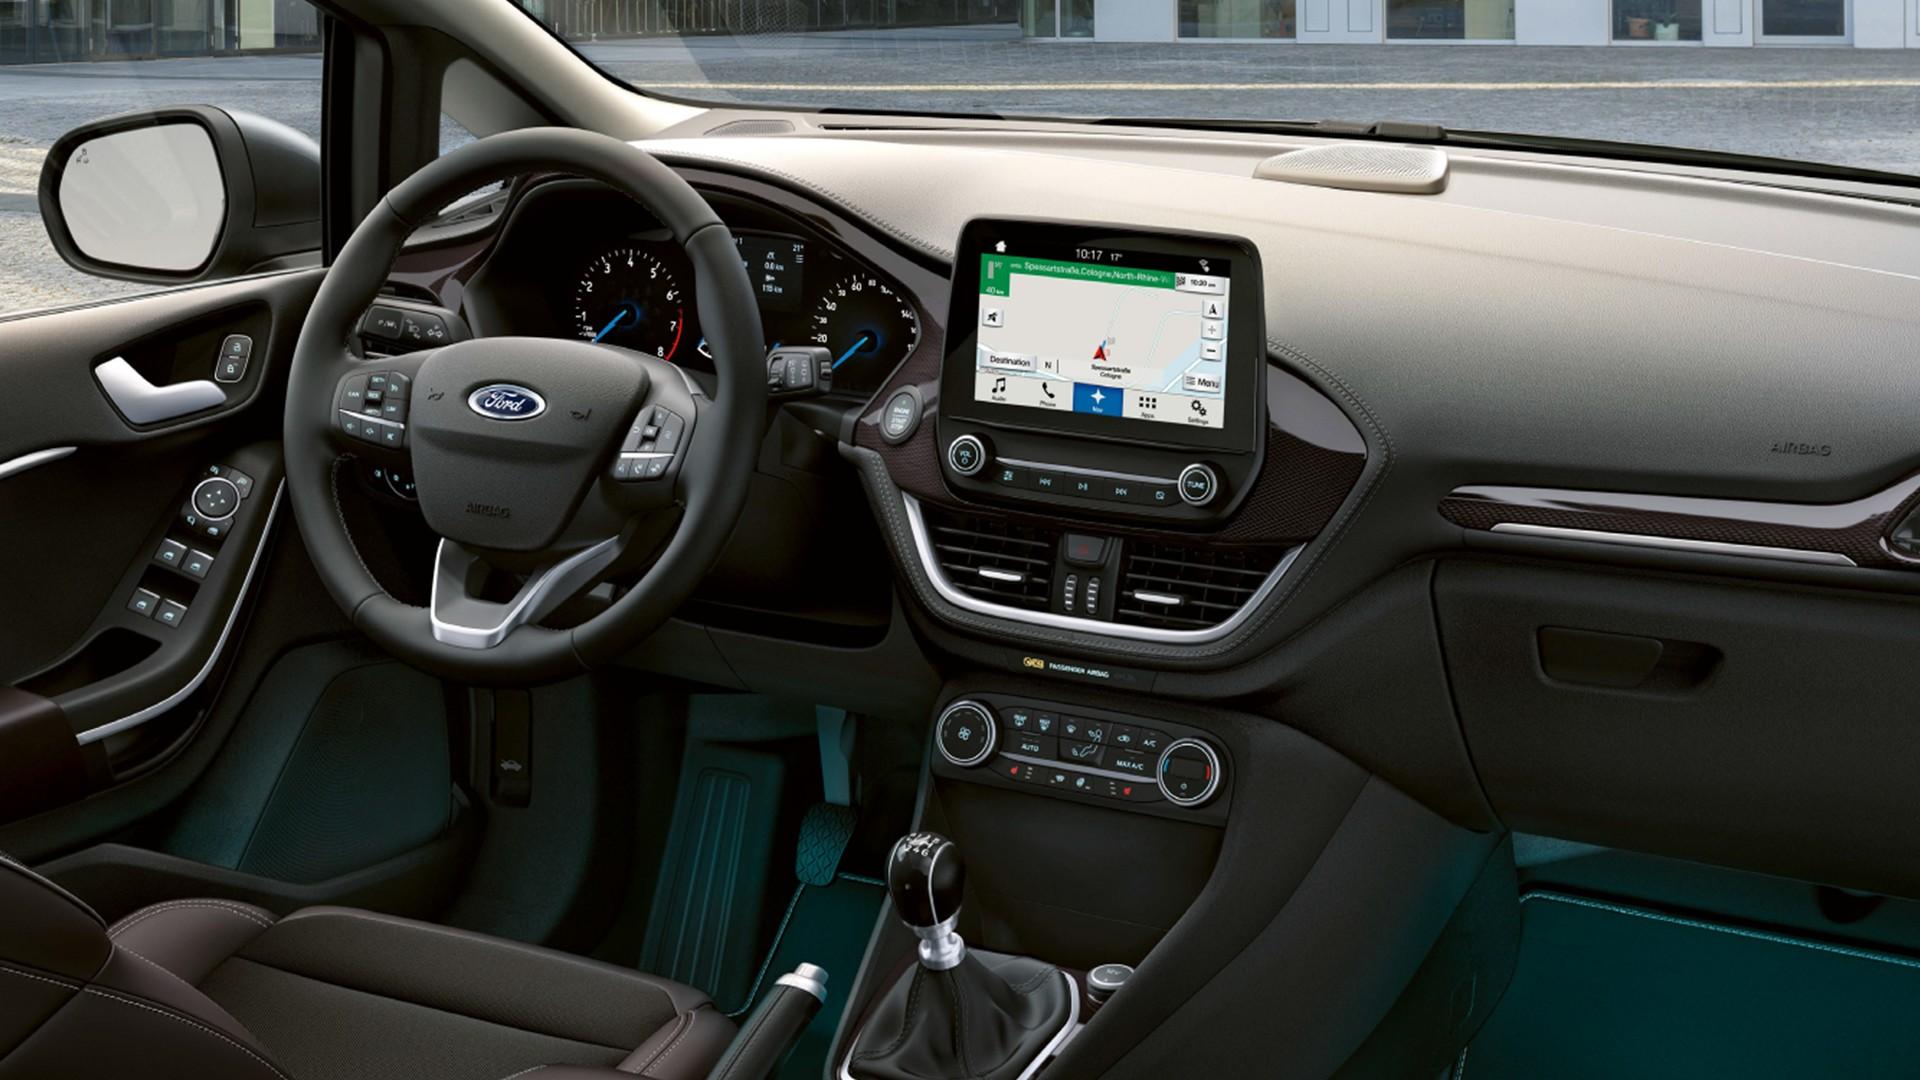 Imagen del interior del Ford Fiesta